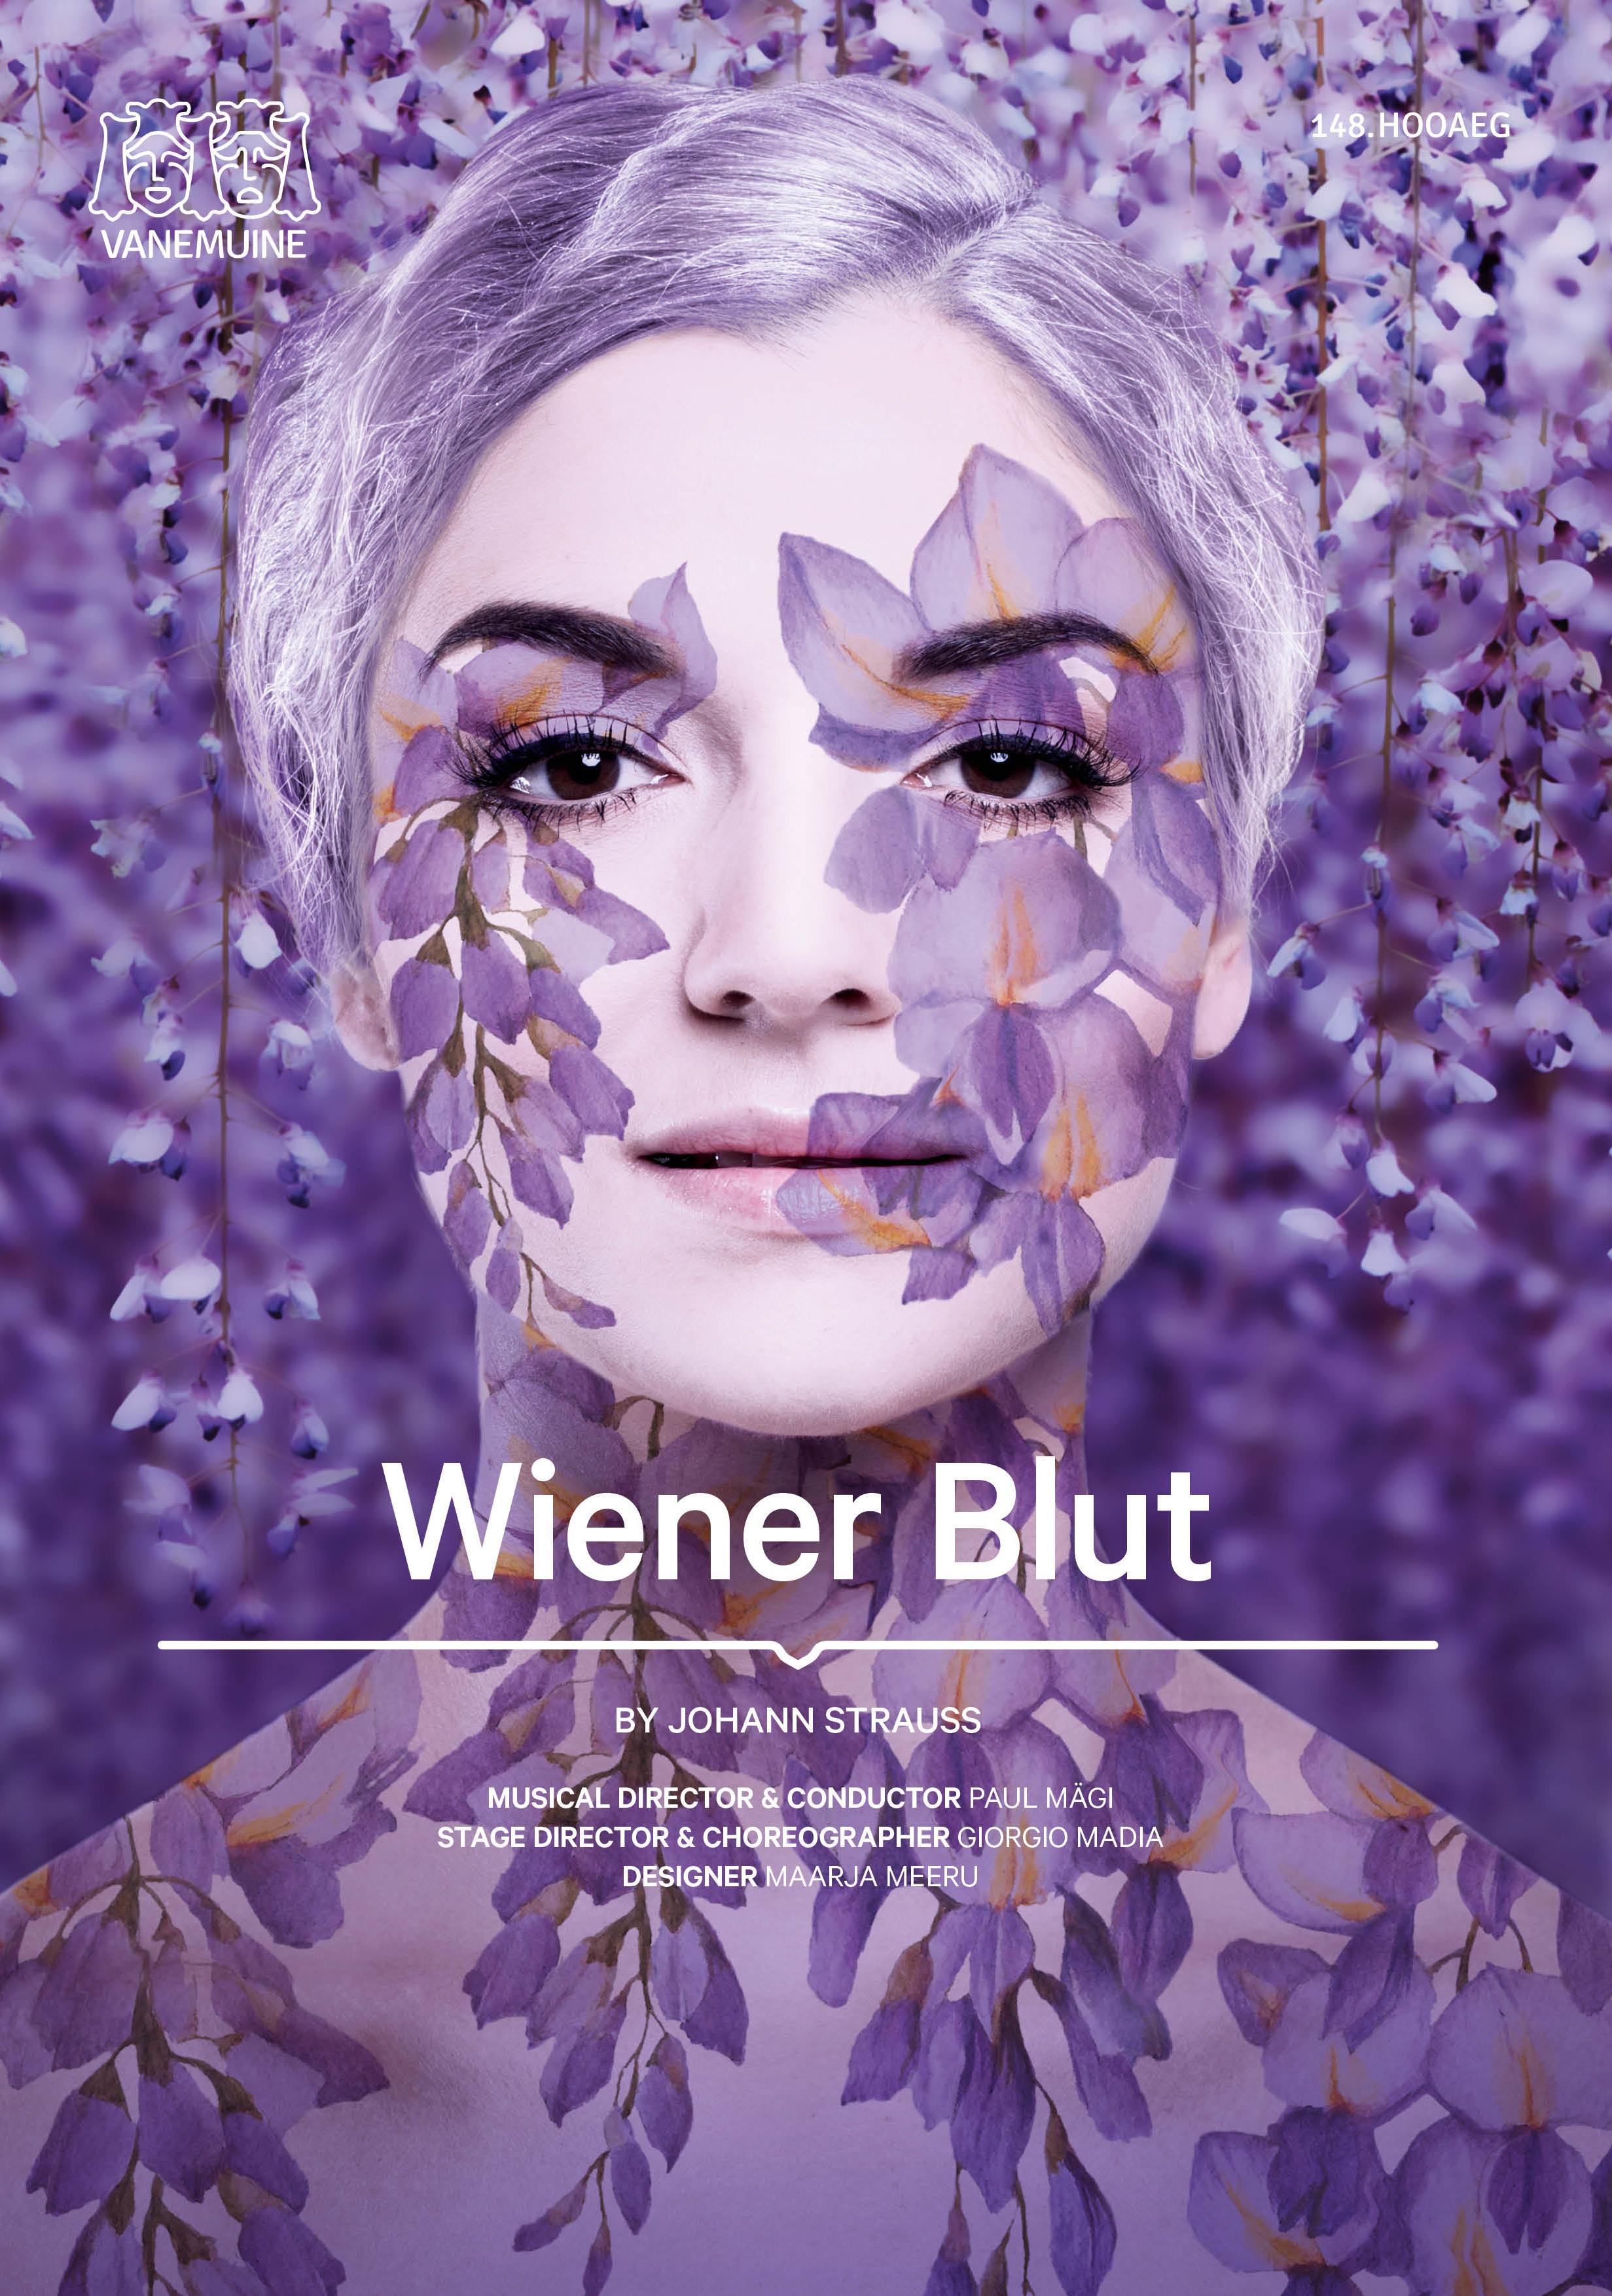 Wiener Blut poster